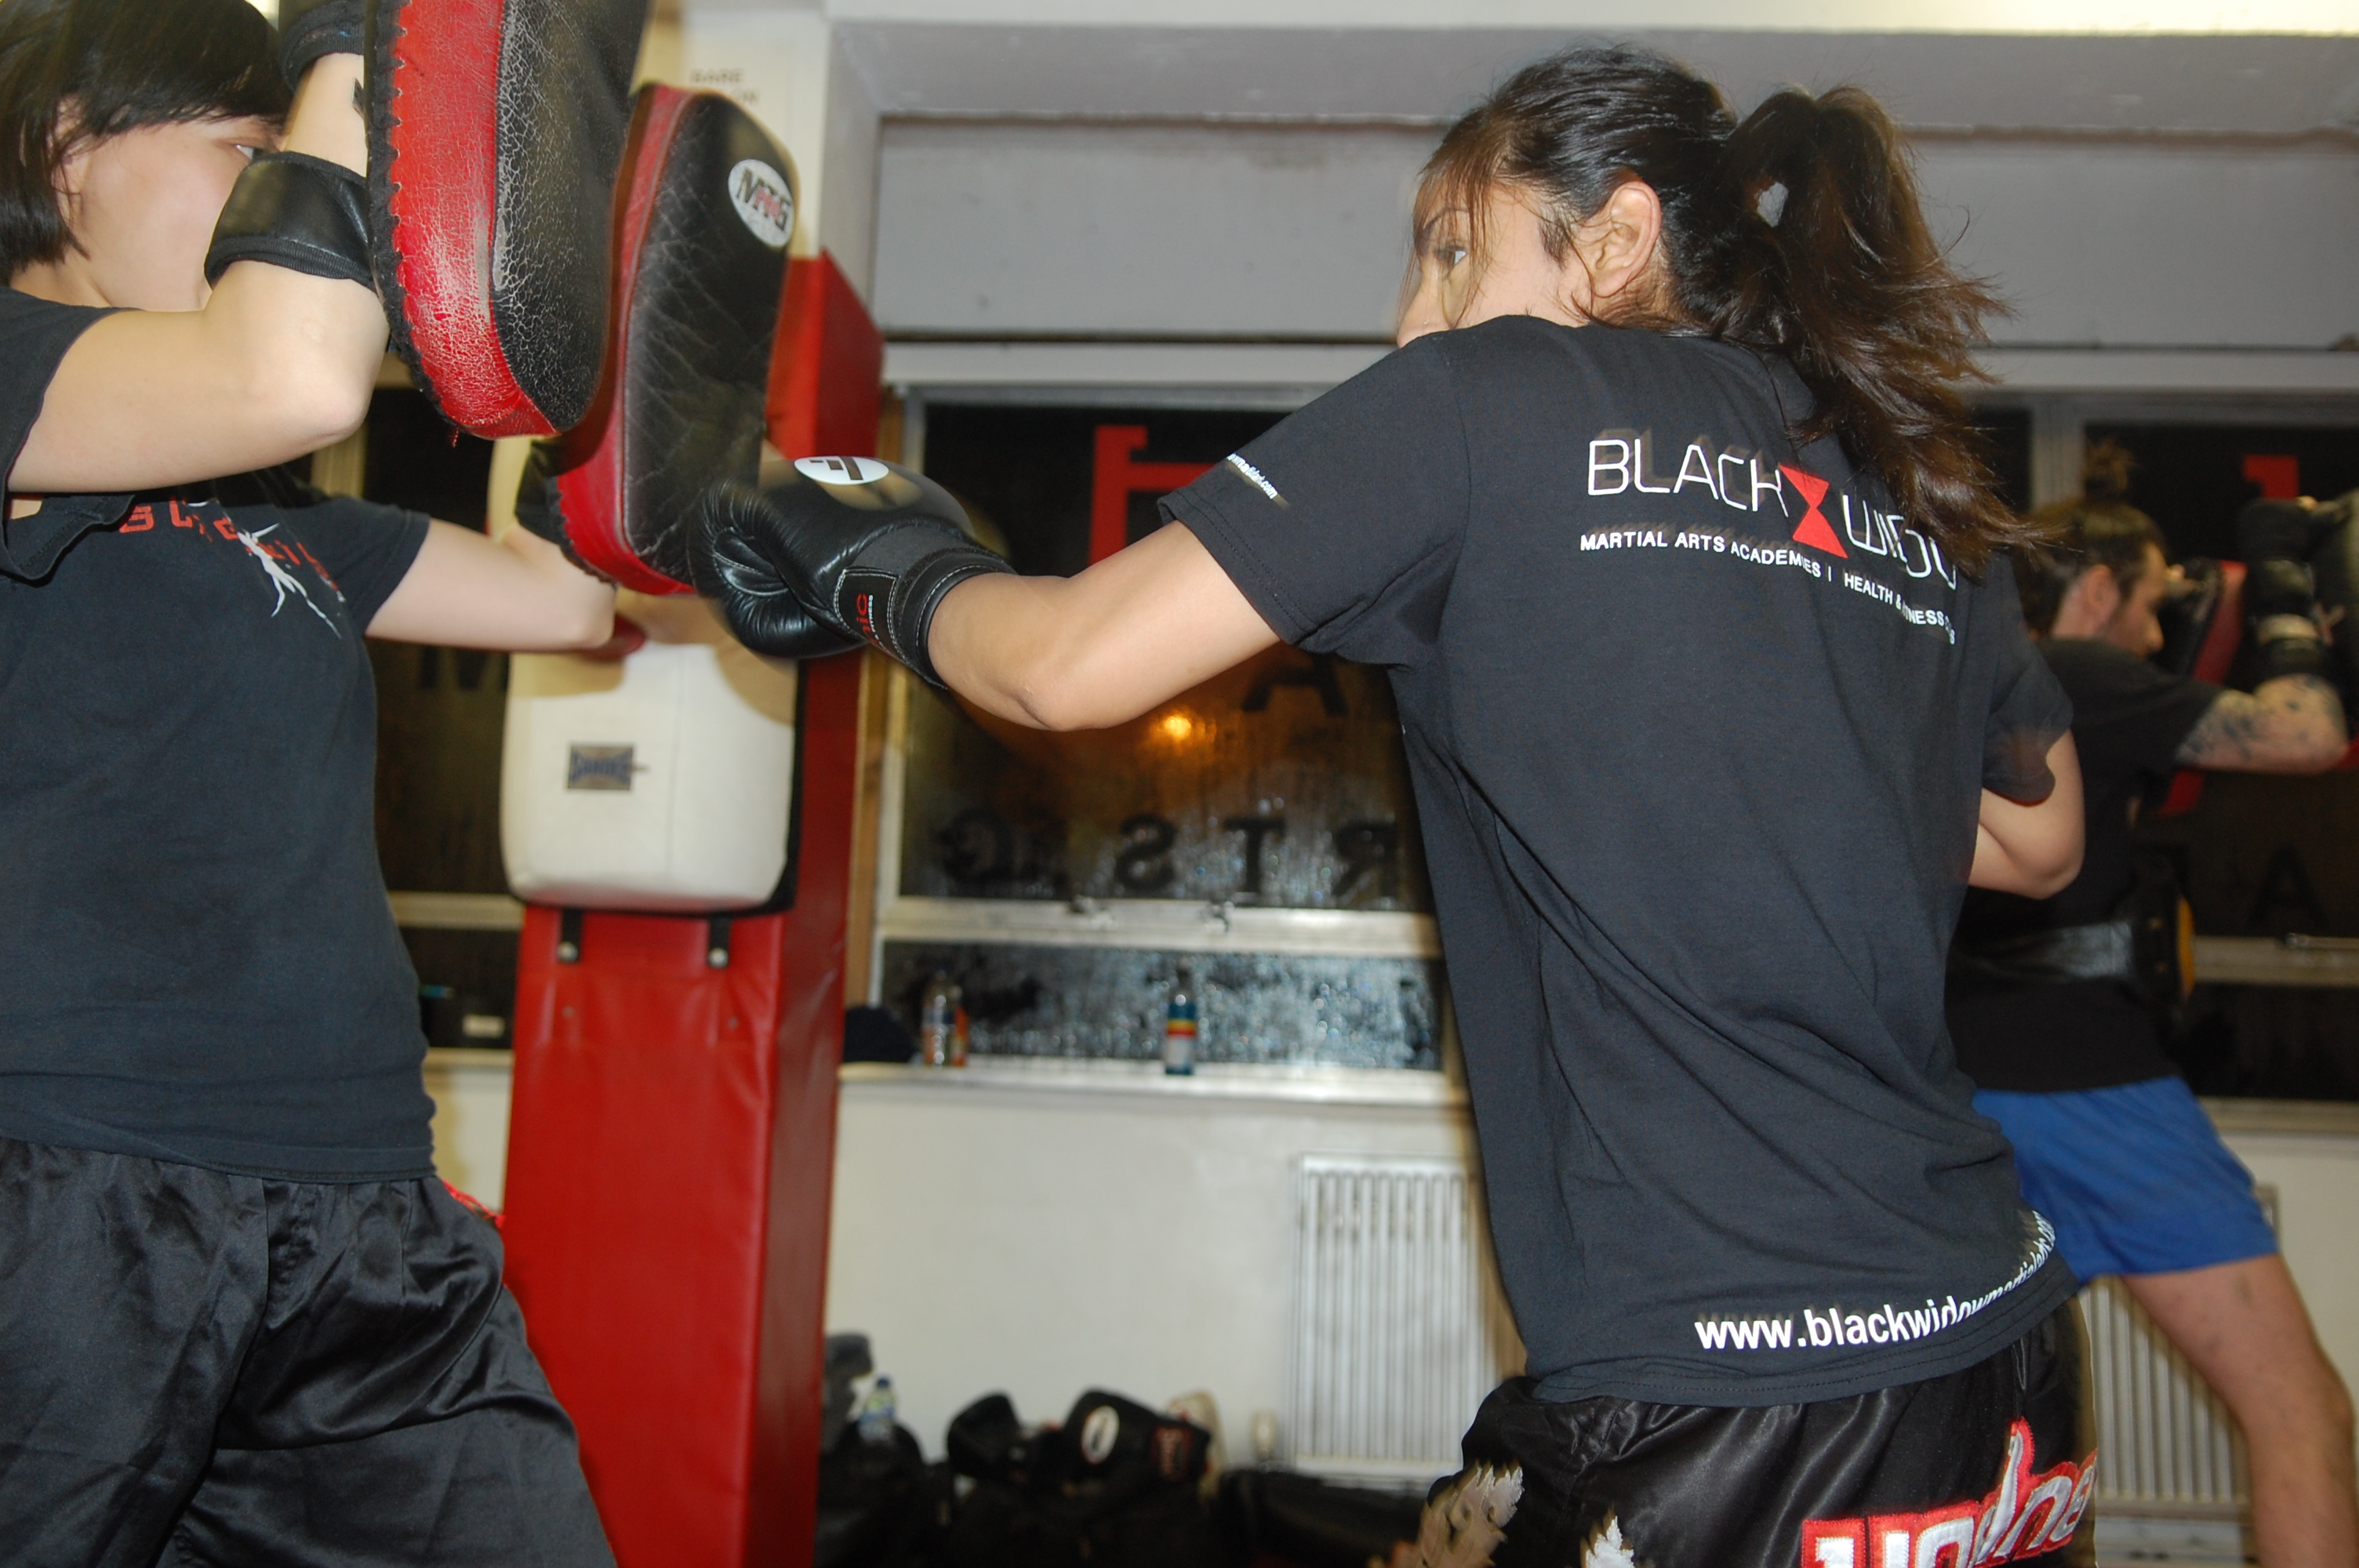 Black-widow-martial-arts-36